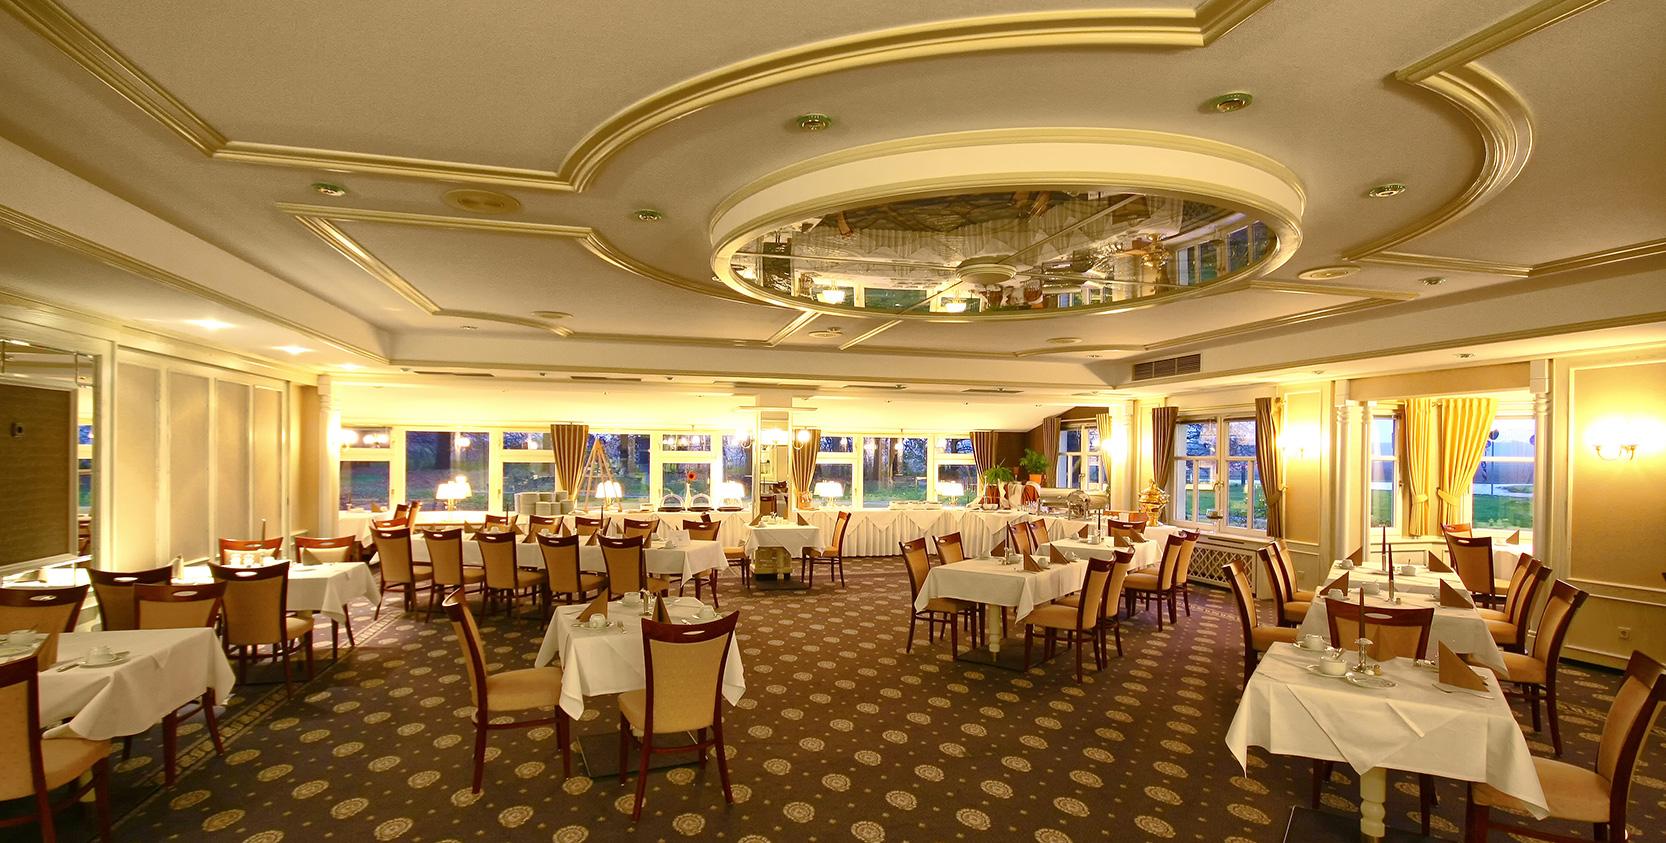 duden-restaurant-03.jpg